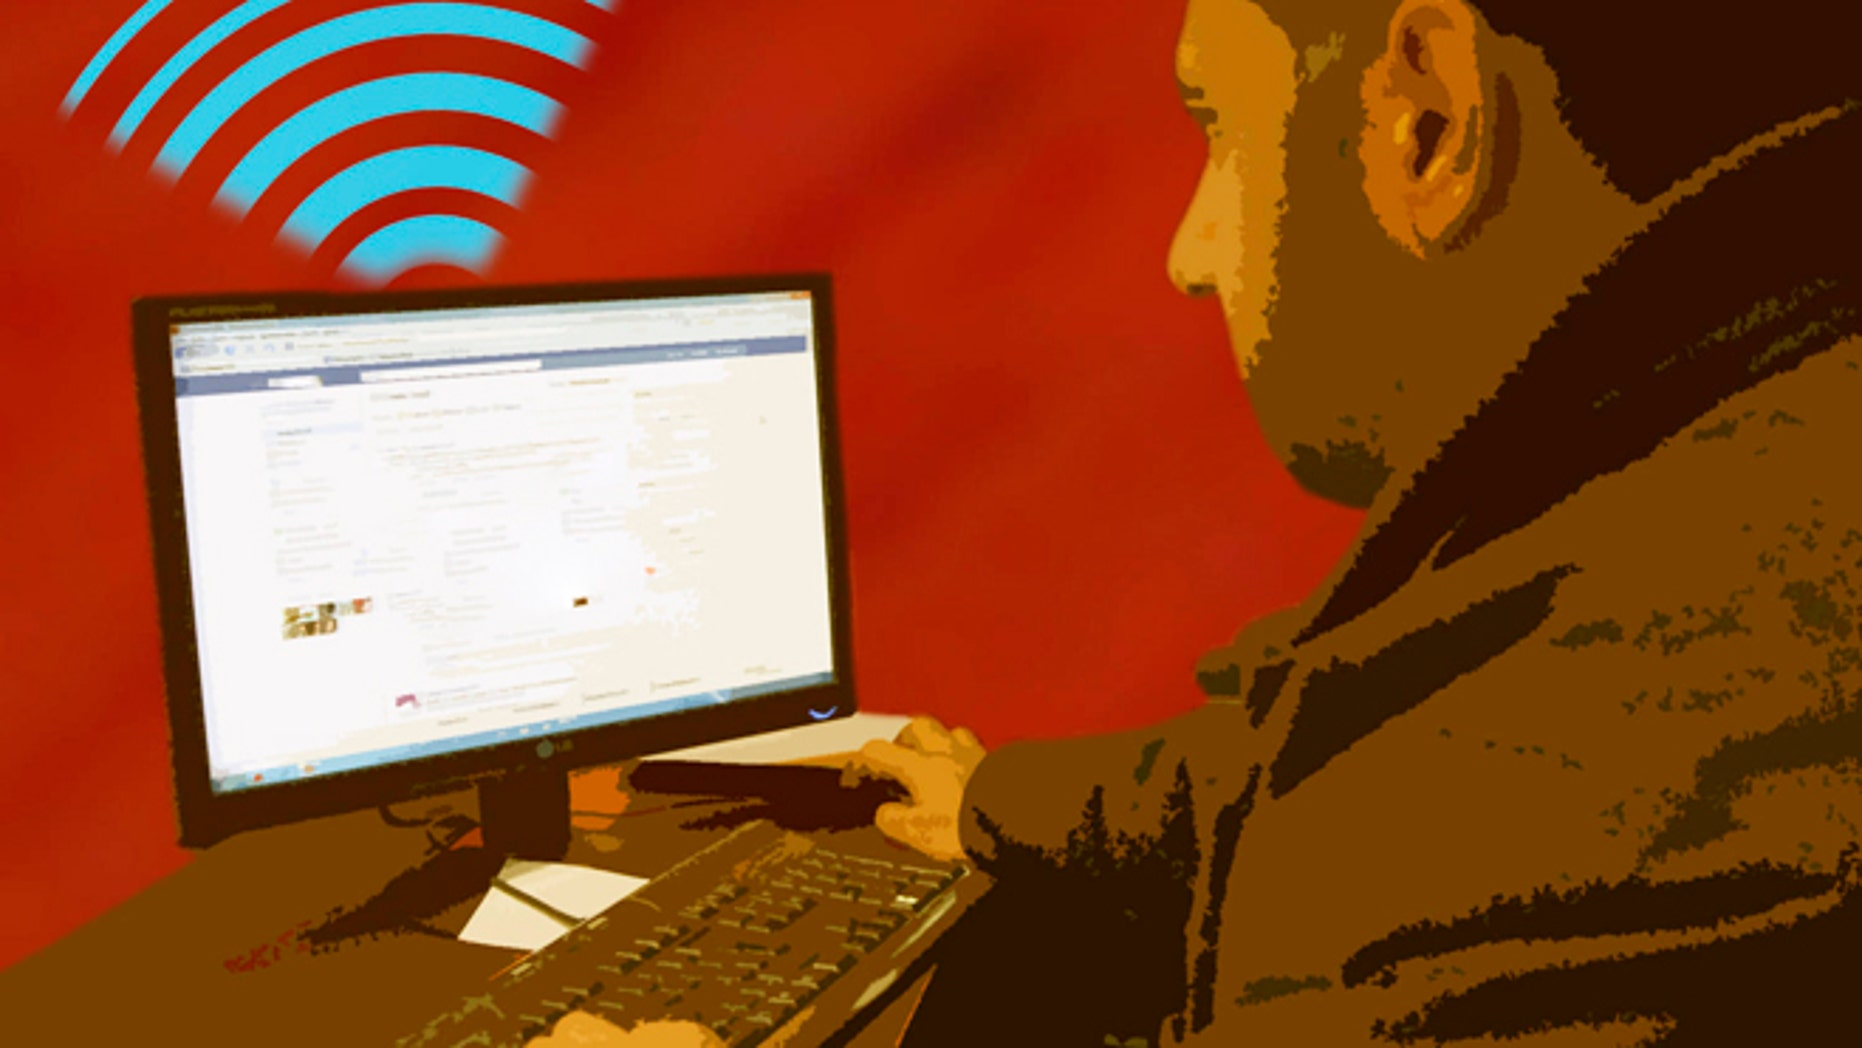 5 ways to find free Wi-Fi wherever you go | Fox News